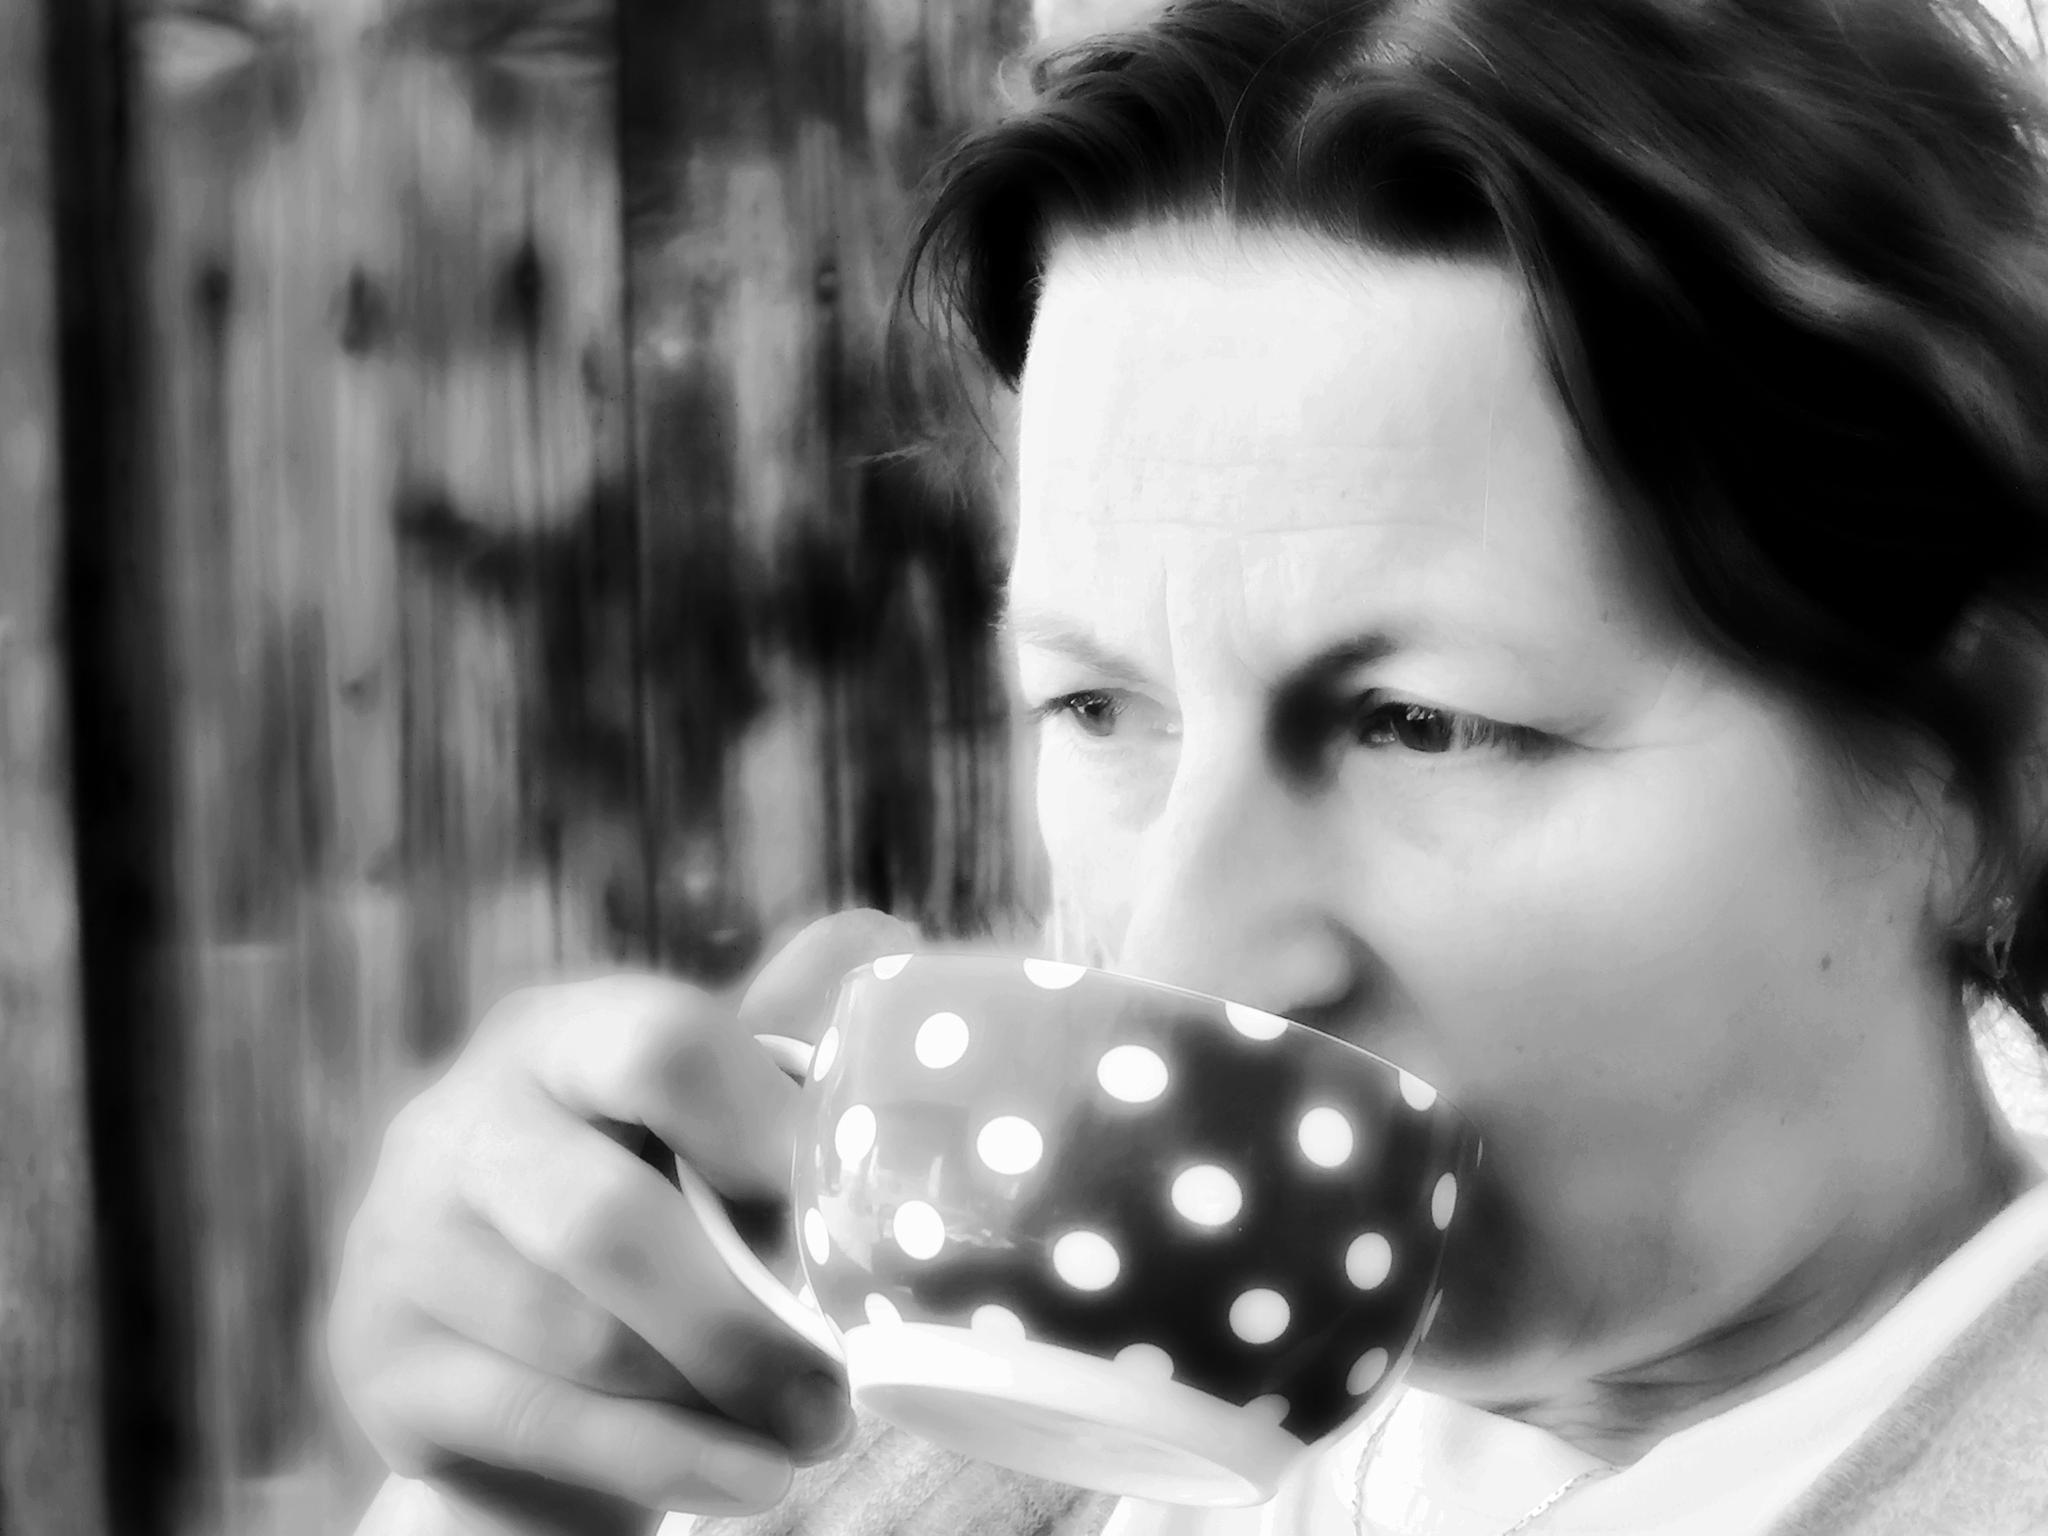 coffe break by dimce.korunoski